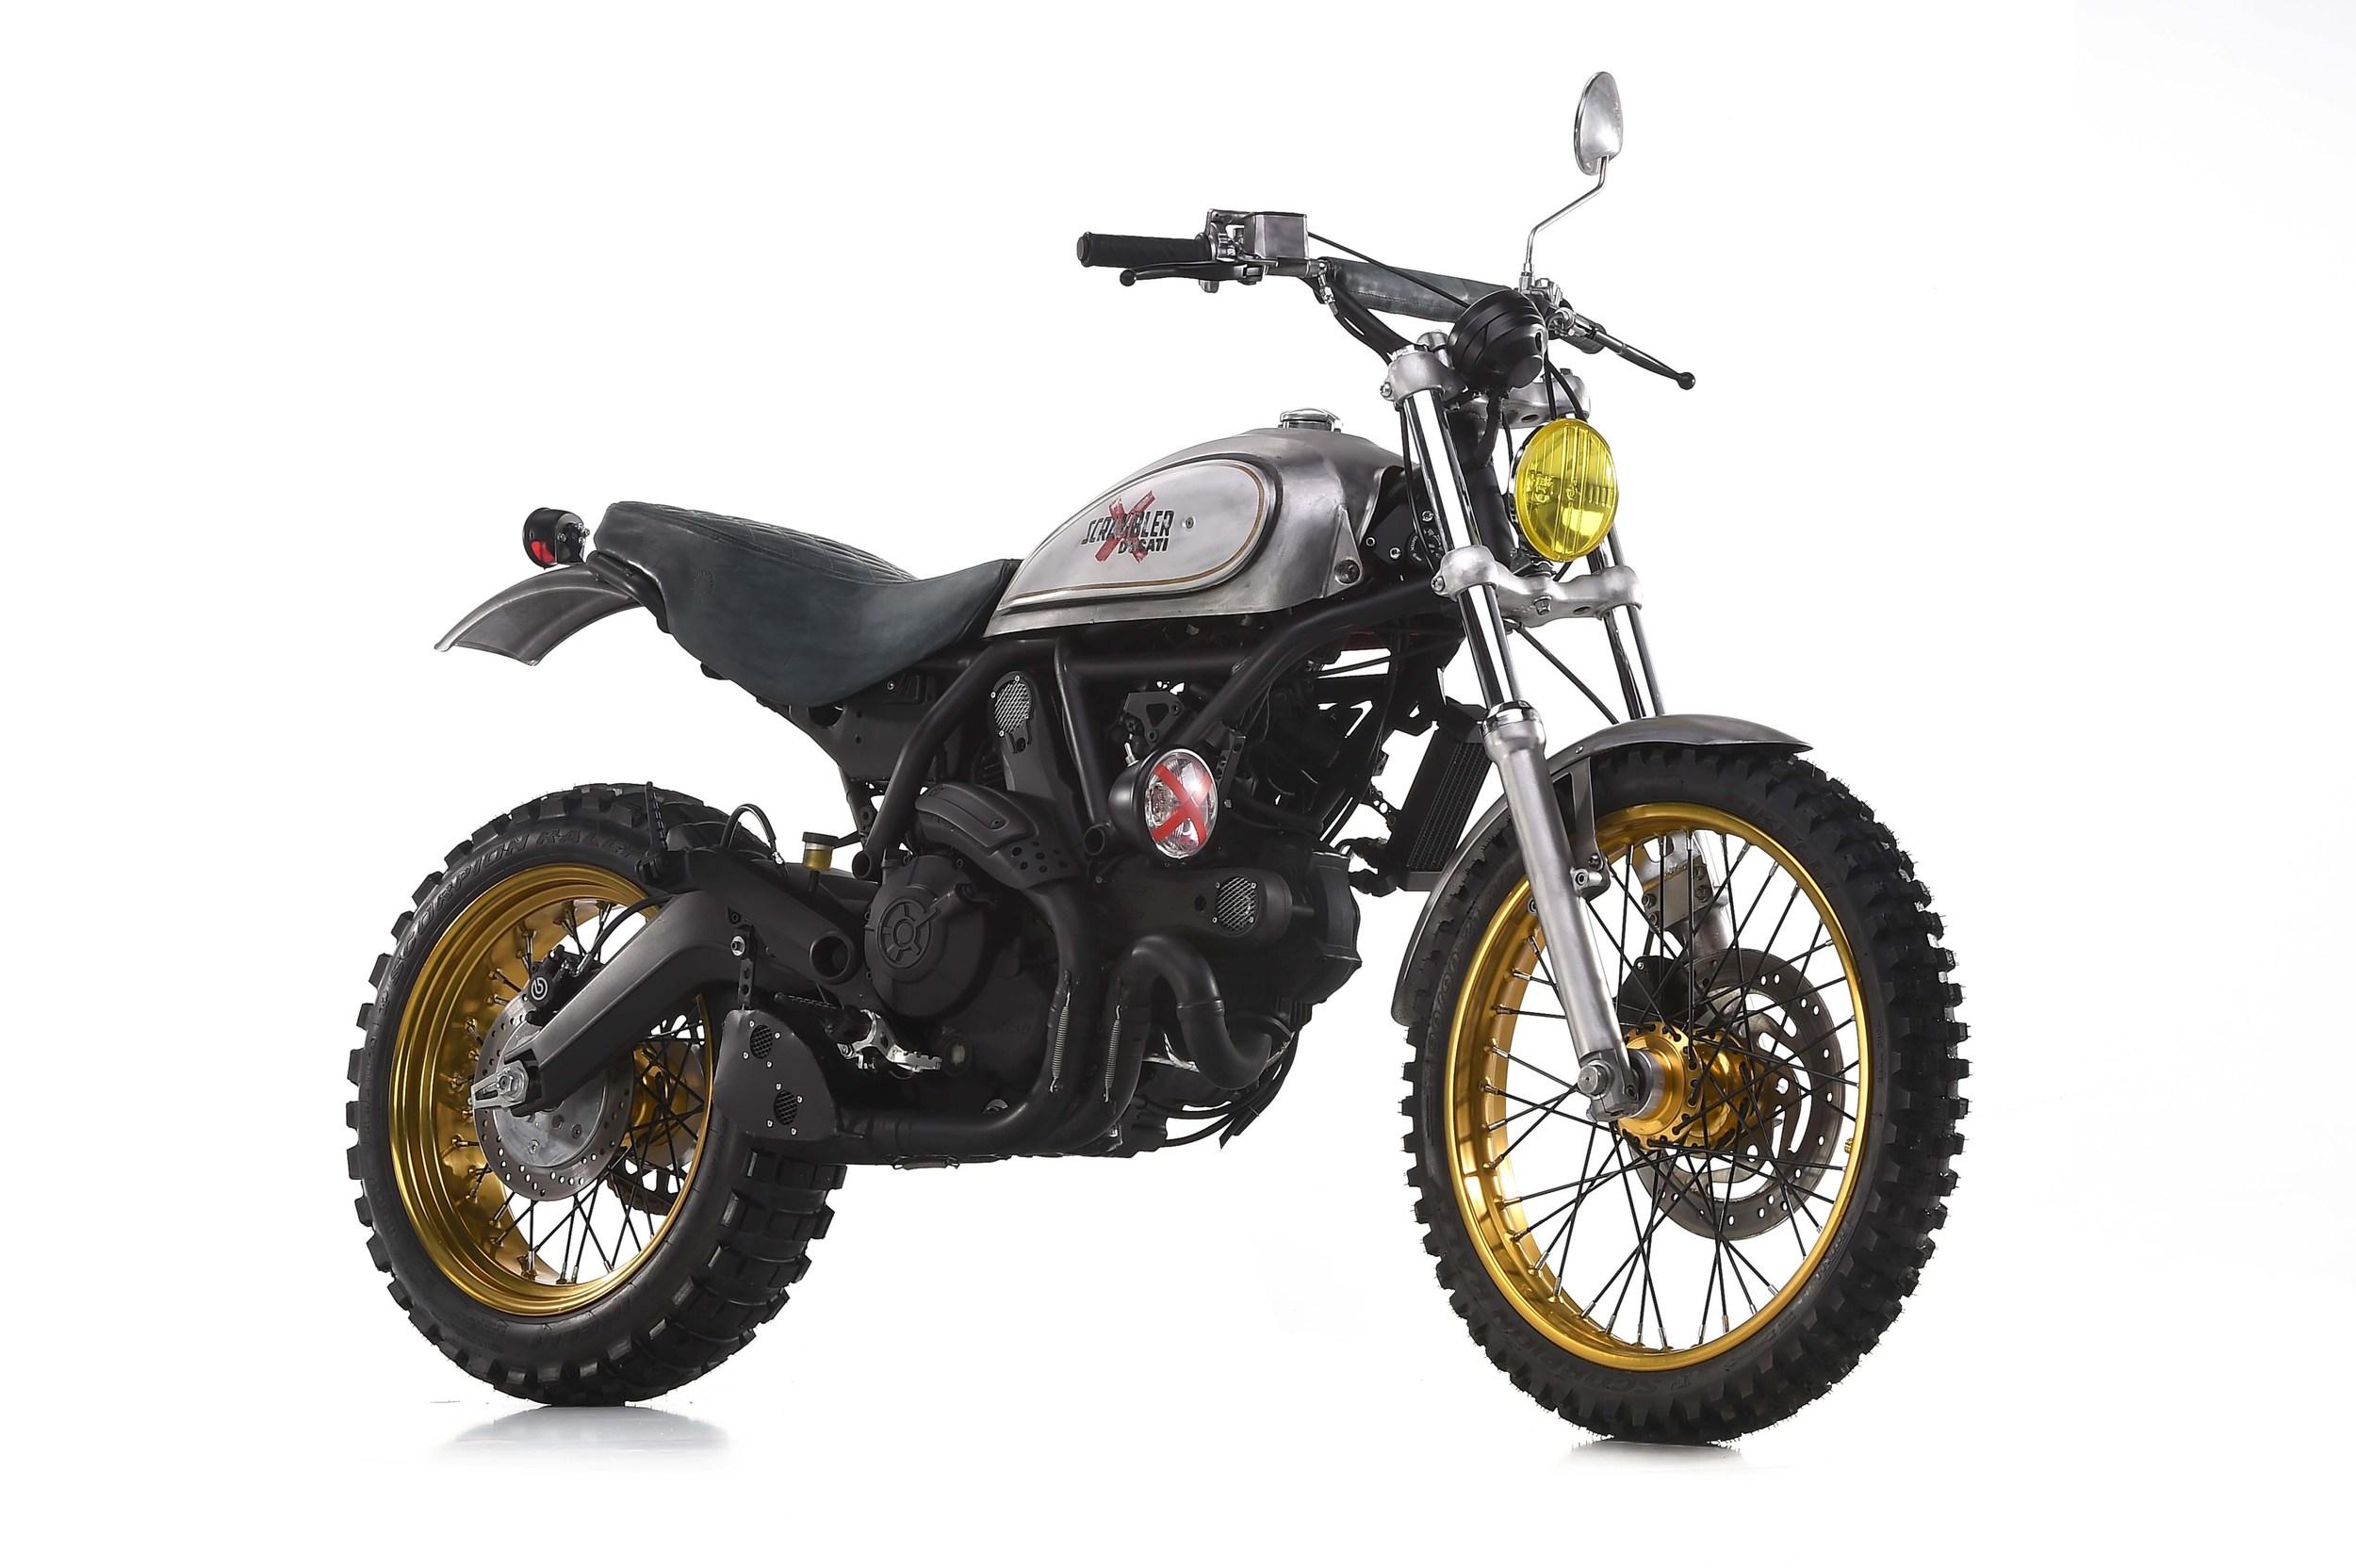 Ducati-Scrambler-Scratch-Concept-Officine-Mermaid-Dario-Mastroianni-09.jpg